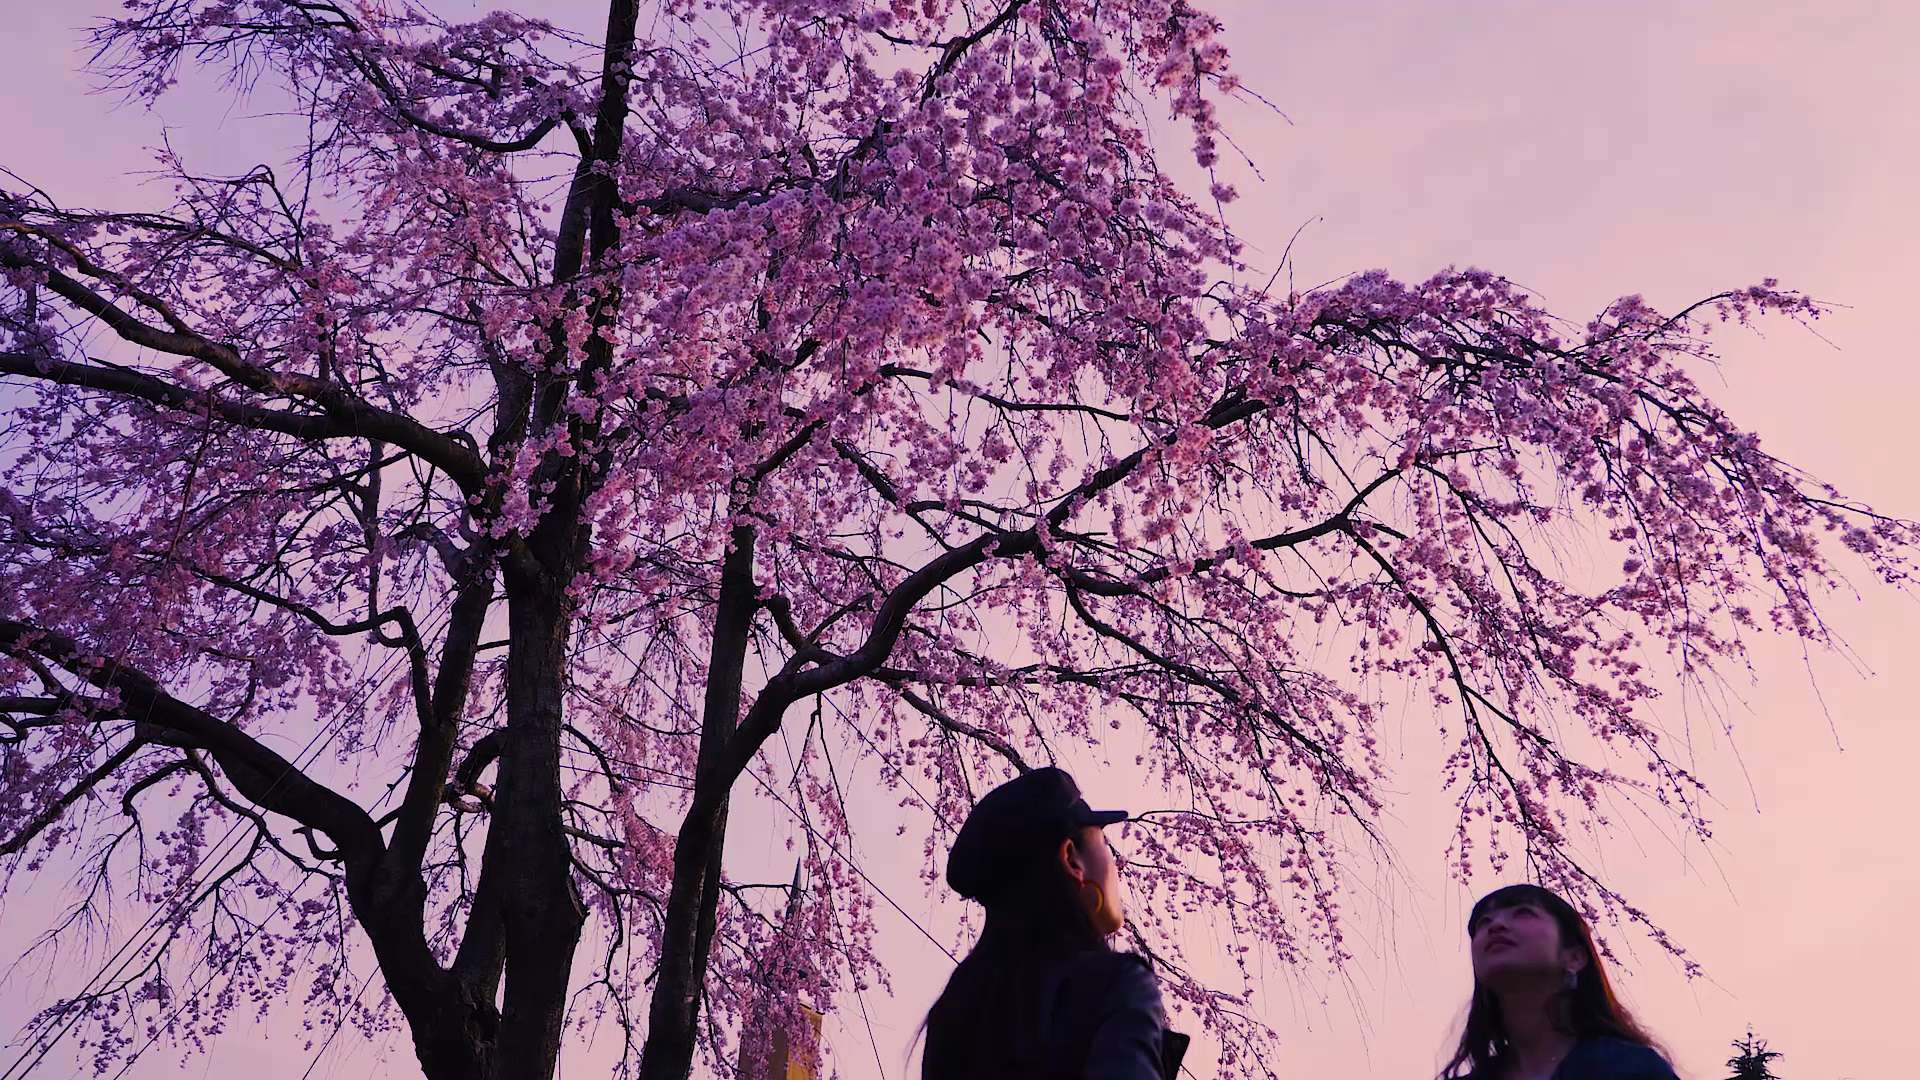 Kawazu-zakura cherry blossoms are seen in full bloom.